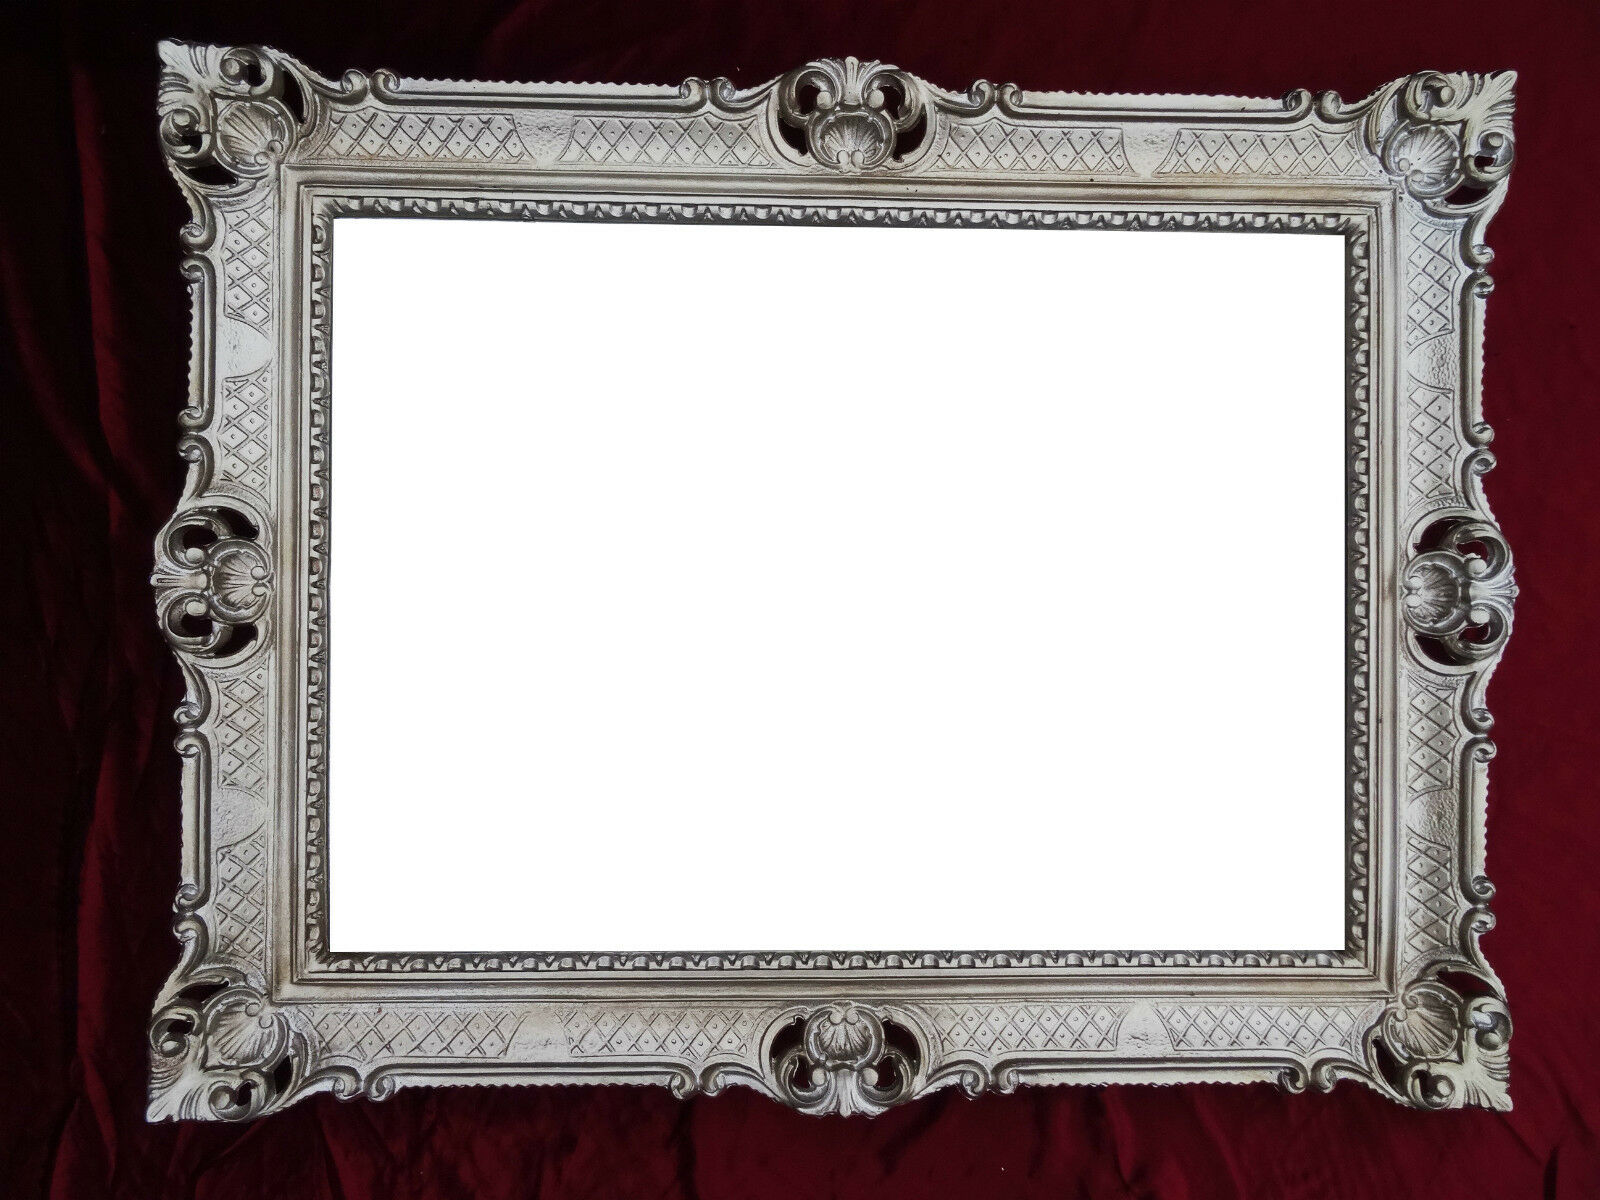 Miroir baroque noir rectangulaire miroir baroque et for Miroir baroque rectangulaire